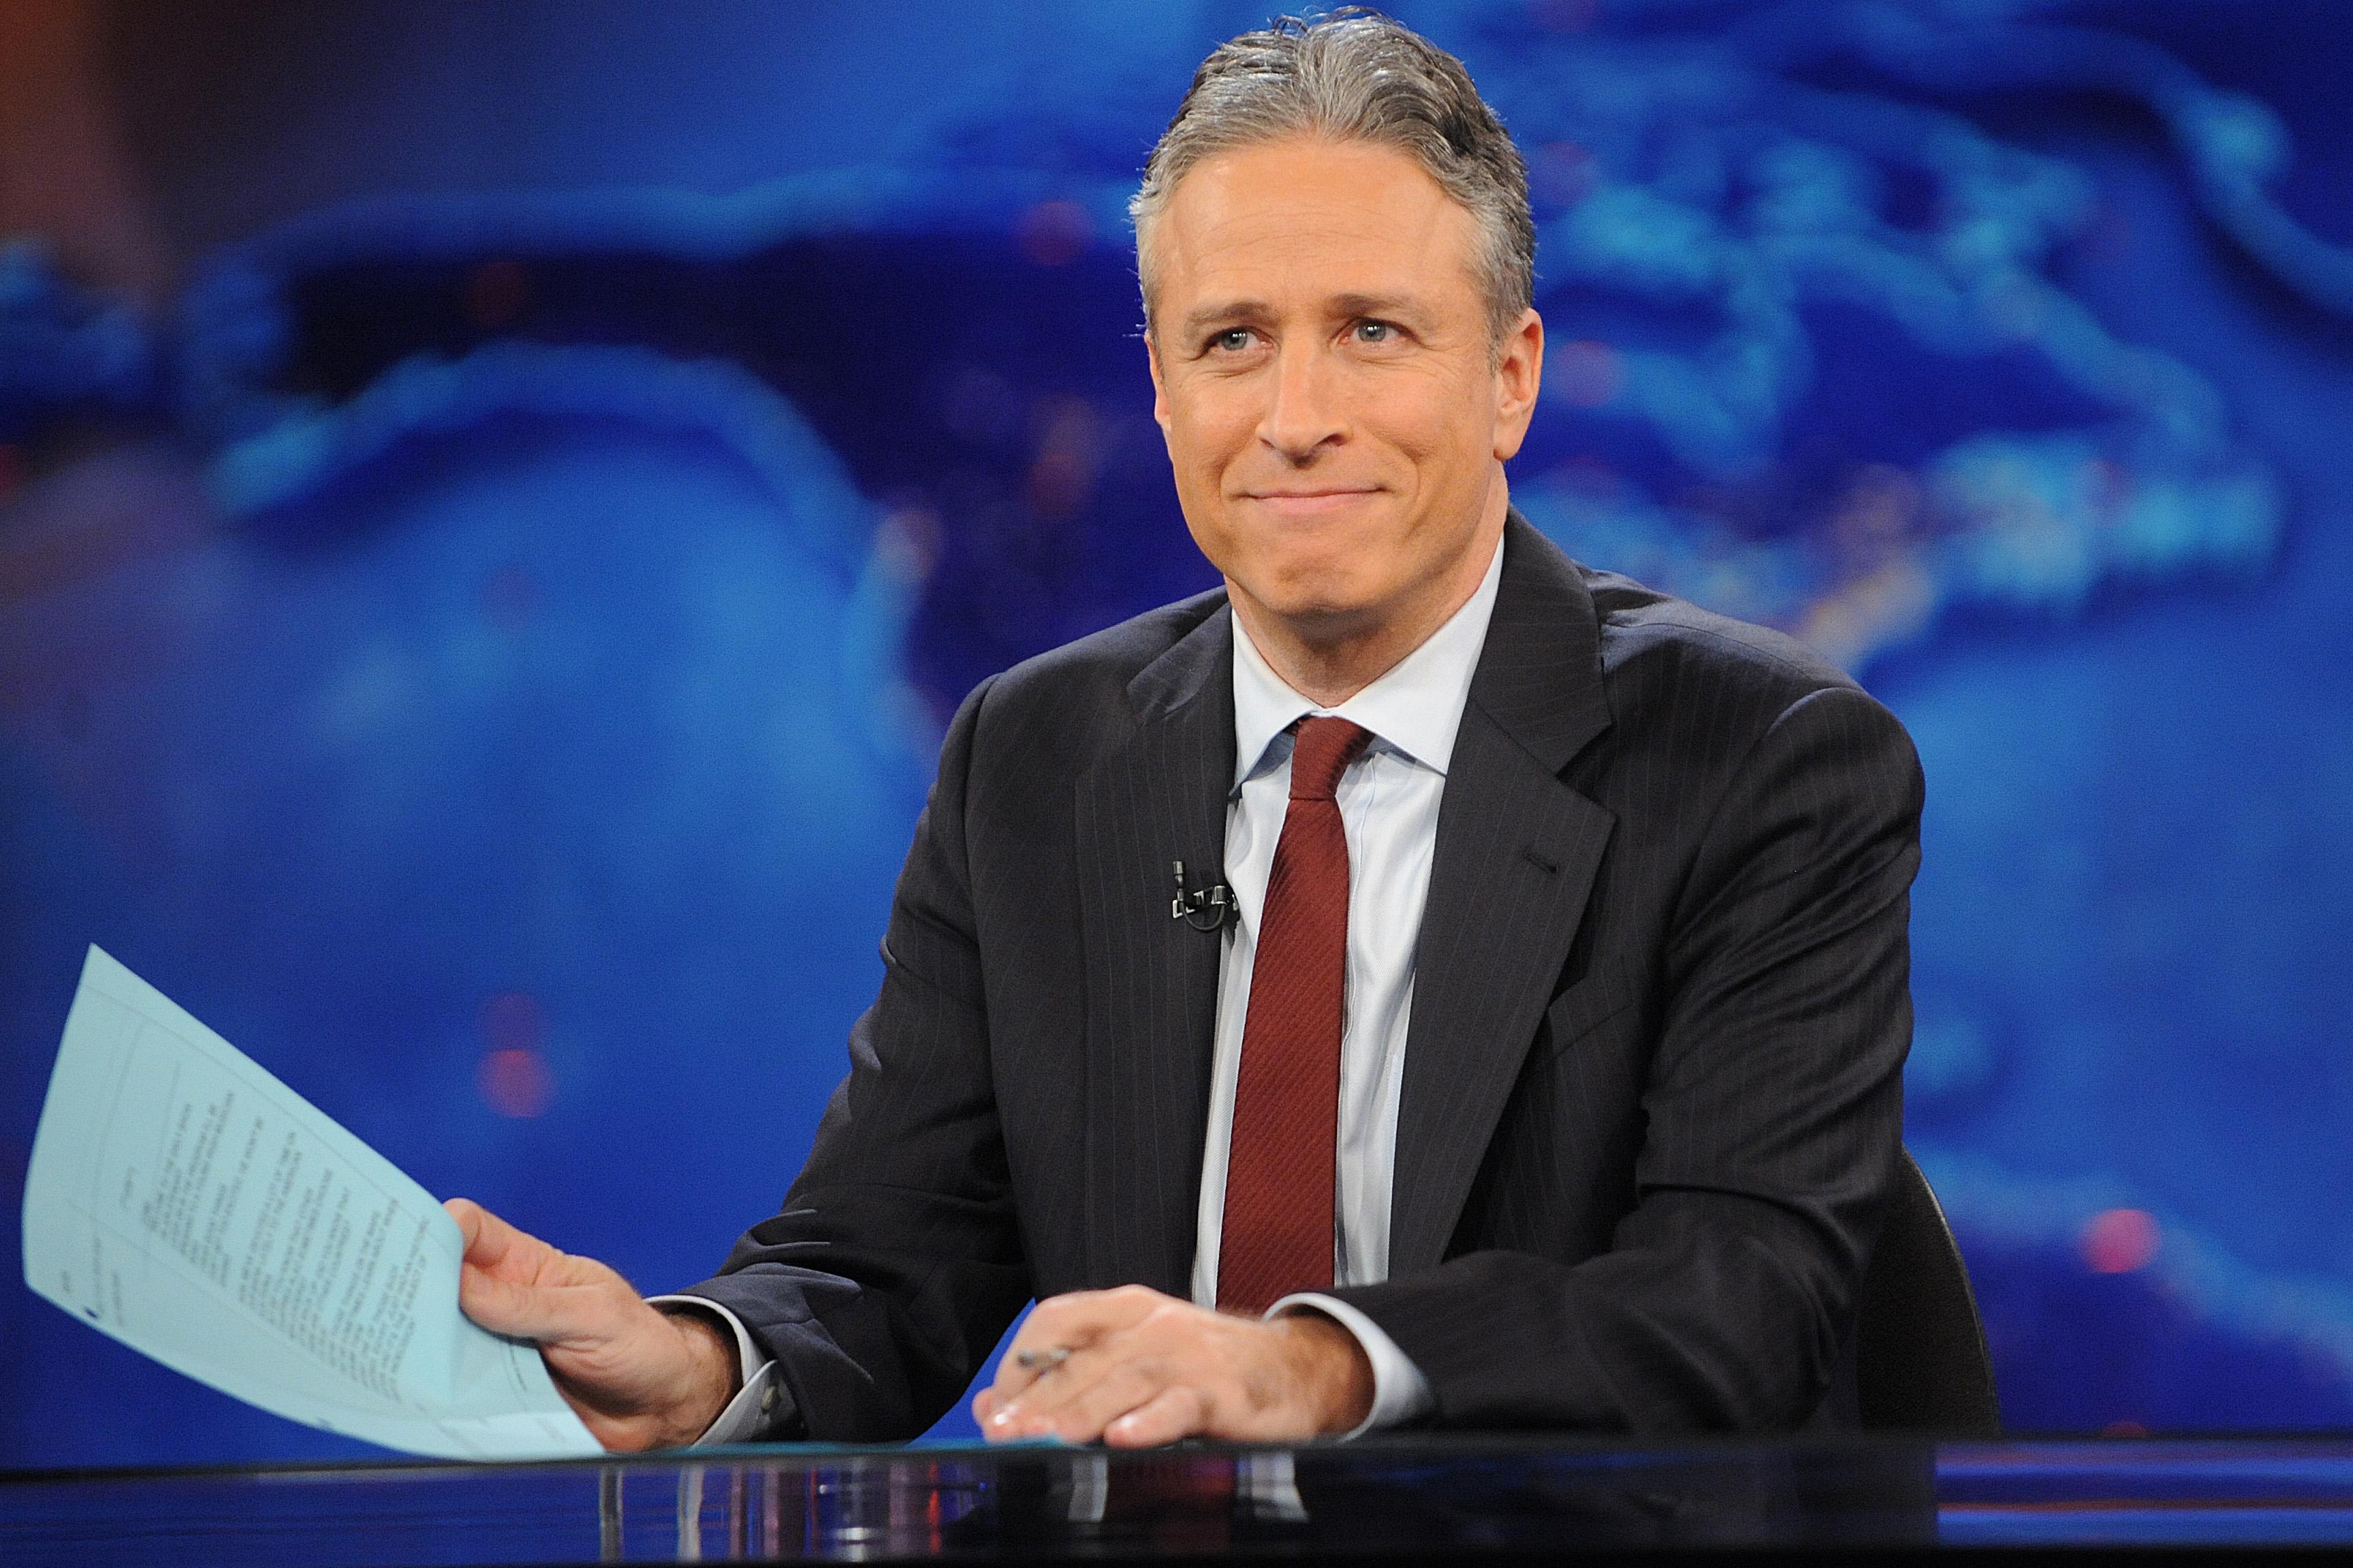 After comedy, Jon Stewart to start animal sanctuary